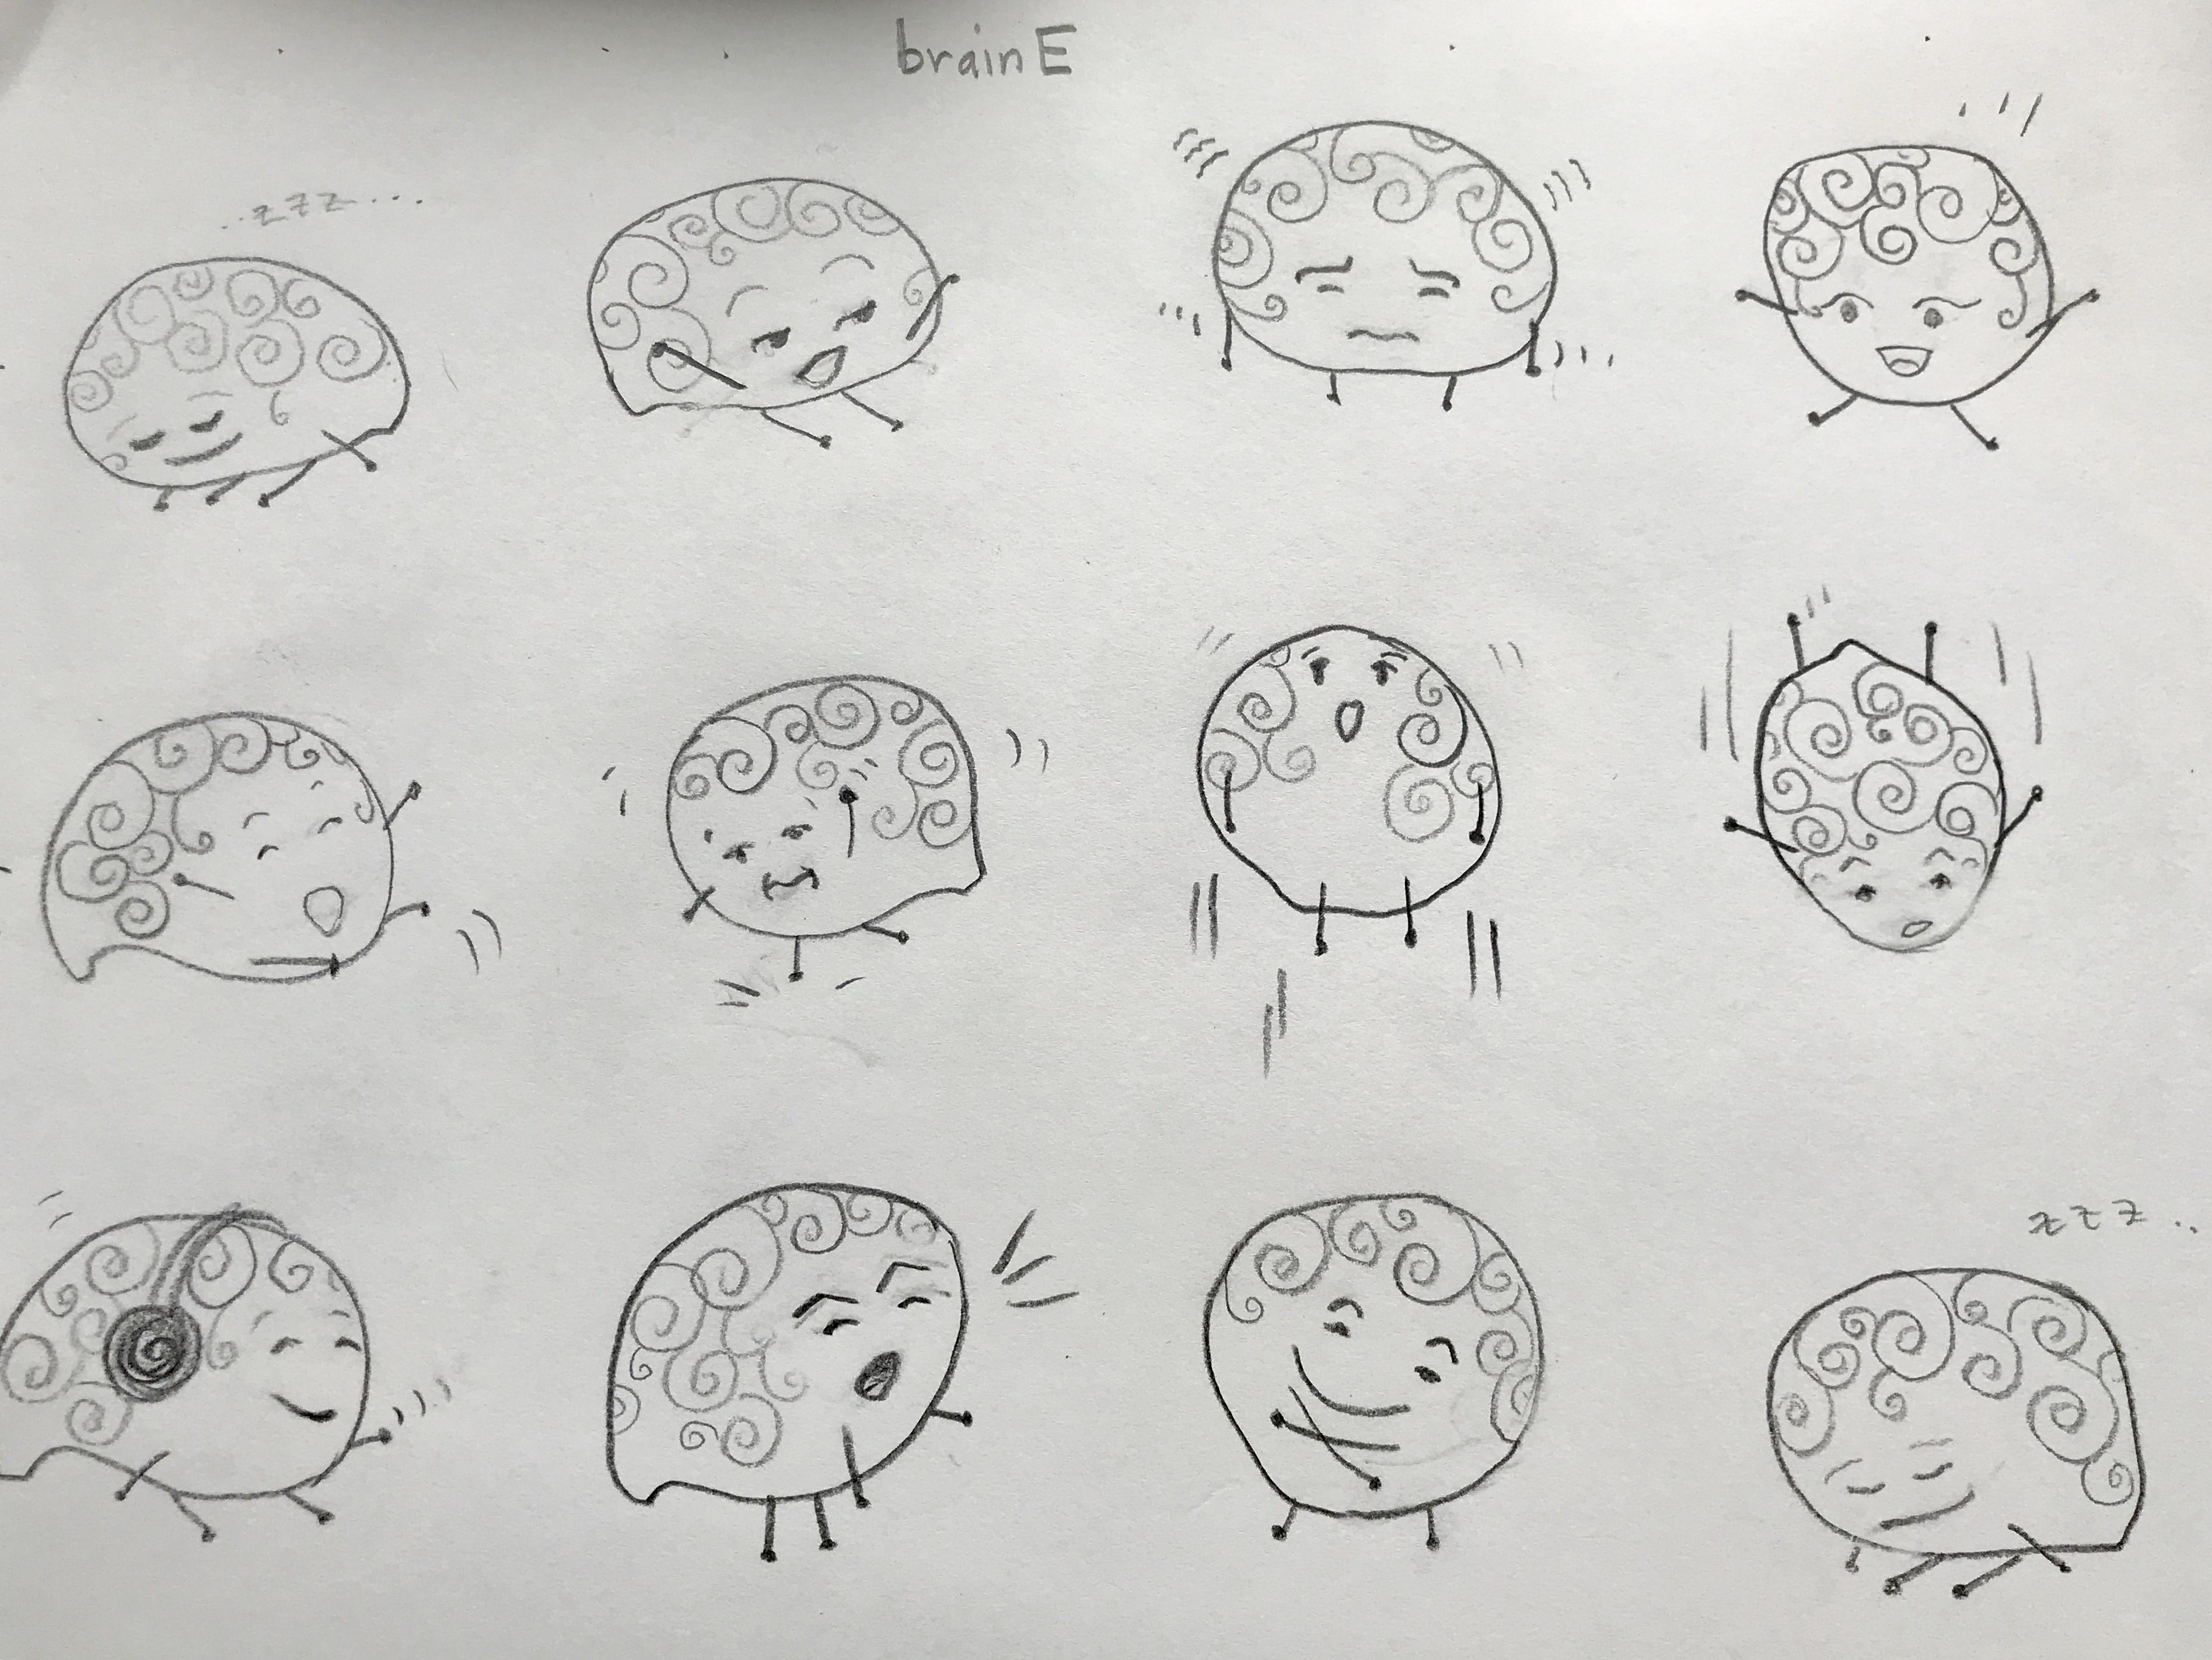 brainE character